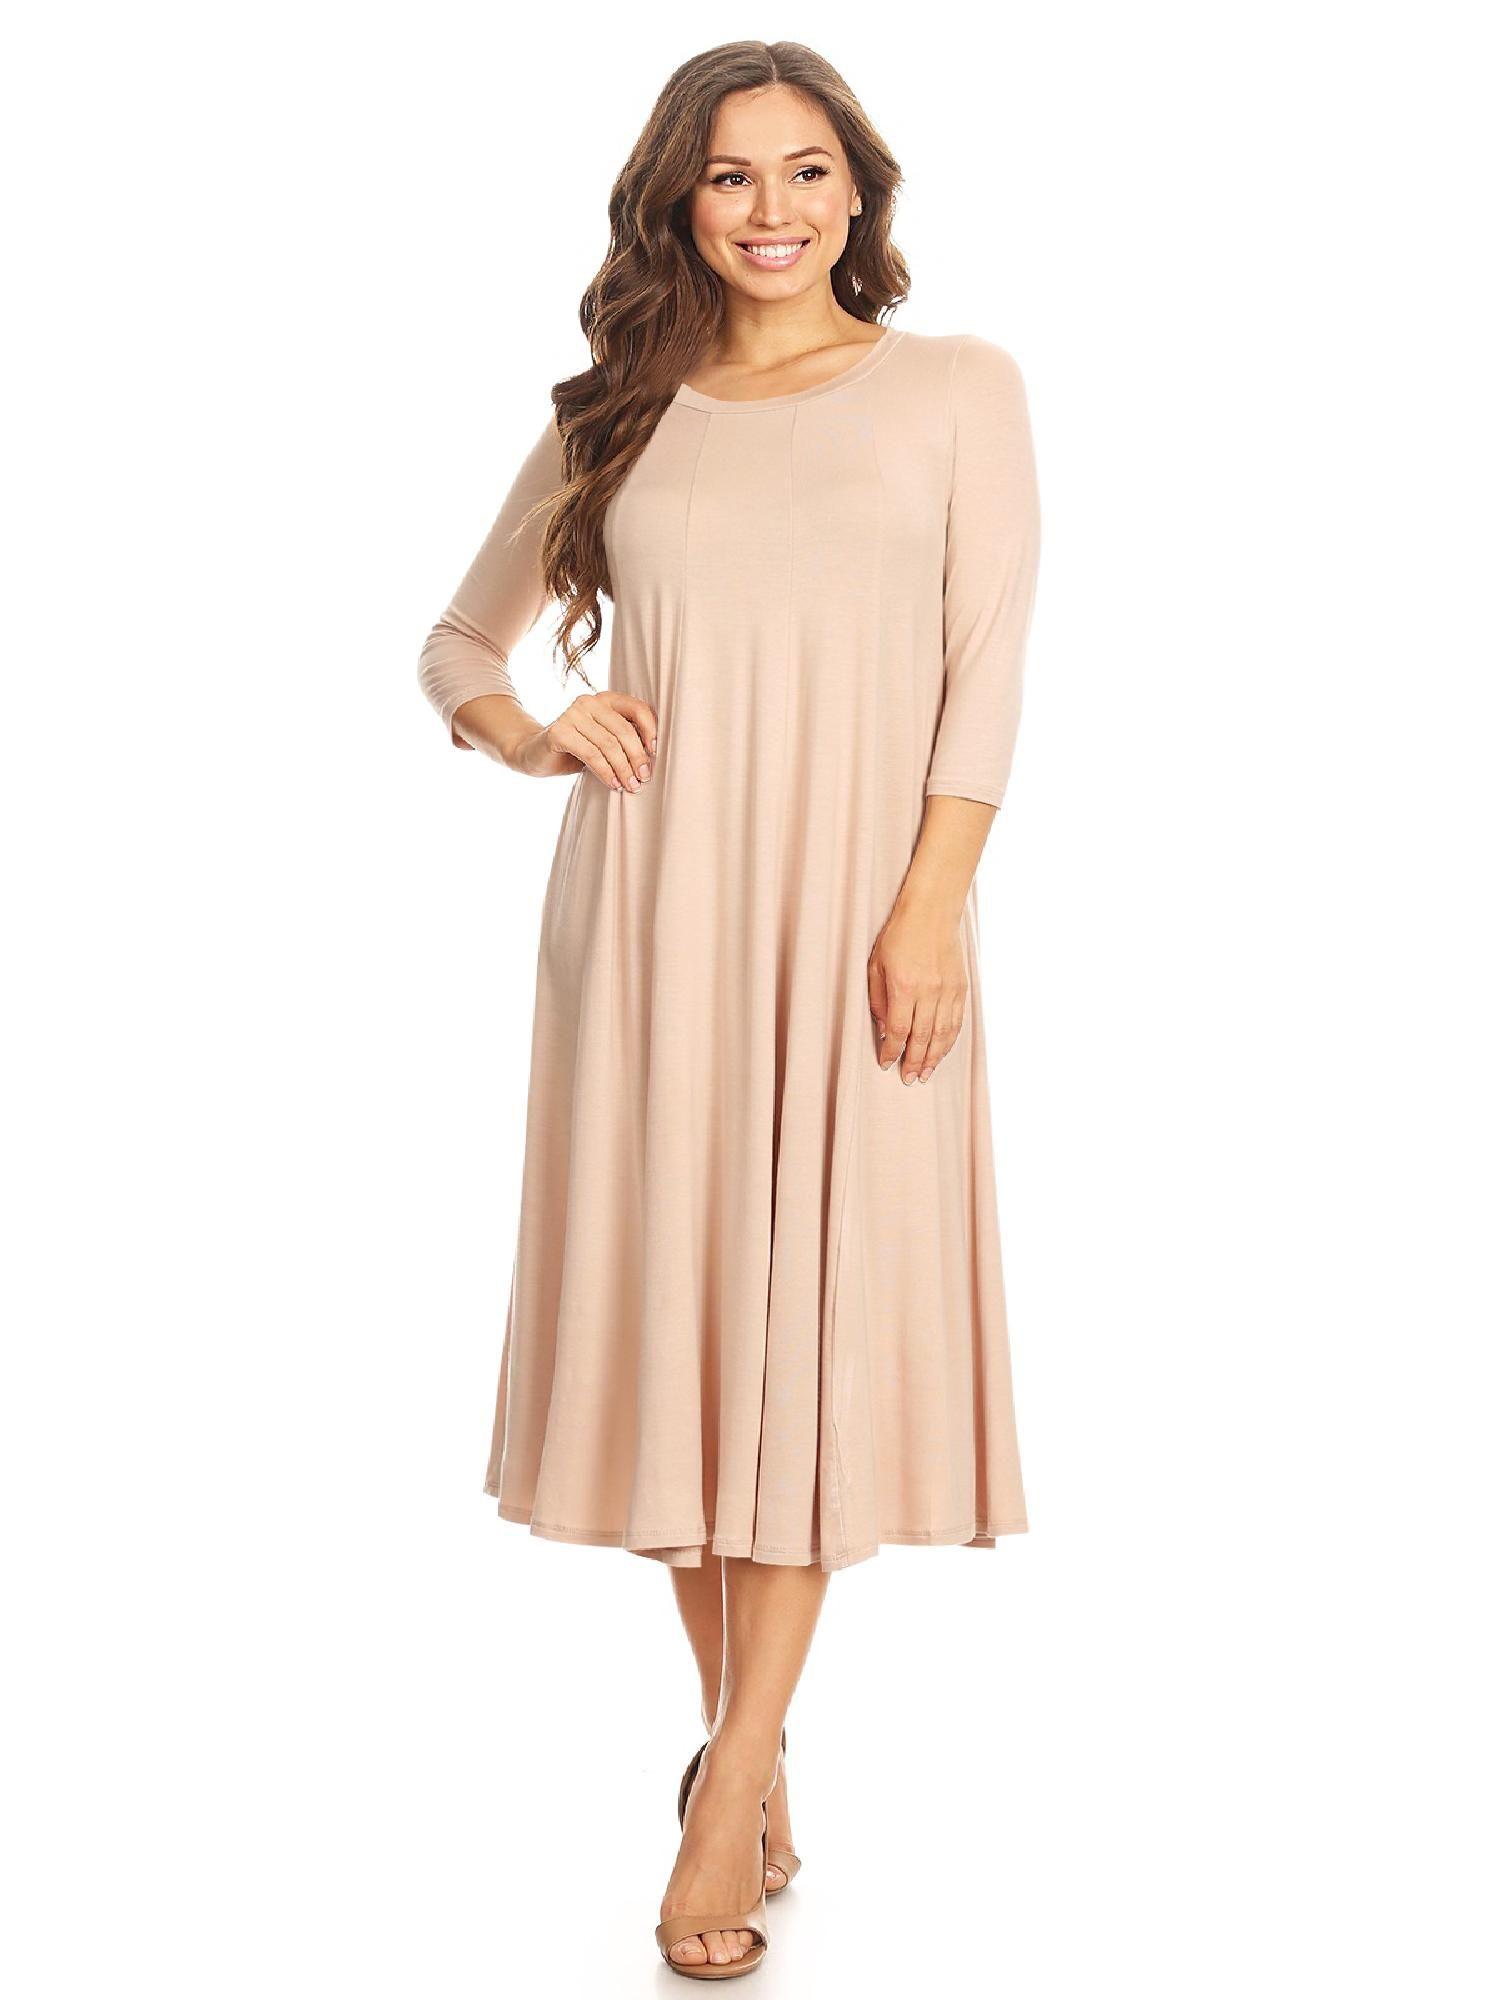 Moa Collection Women S Casual Basic Comfy 3 4 Sleeve Flare A Line Midi Long Maxi Dress Walmart Com Solid Midi Dress Long Maxi Dress Midi Dress Style [ 2000 x 1500 Pixel ]